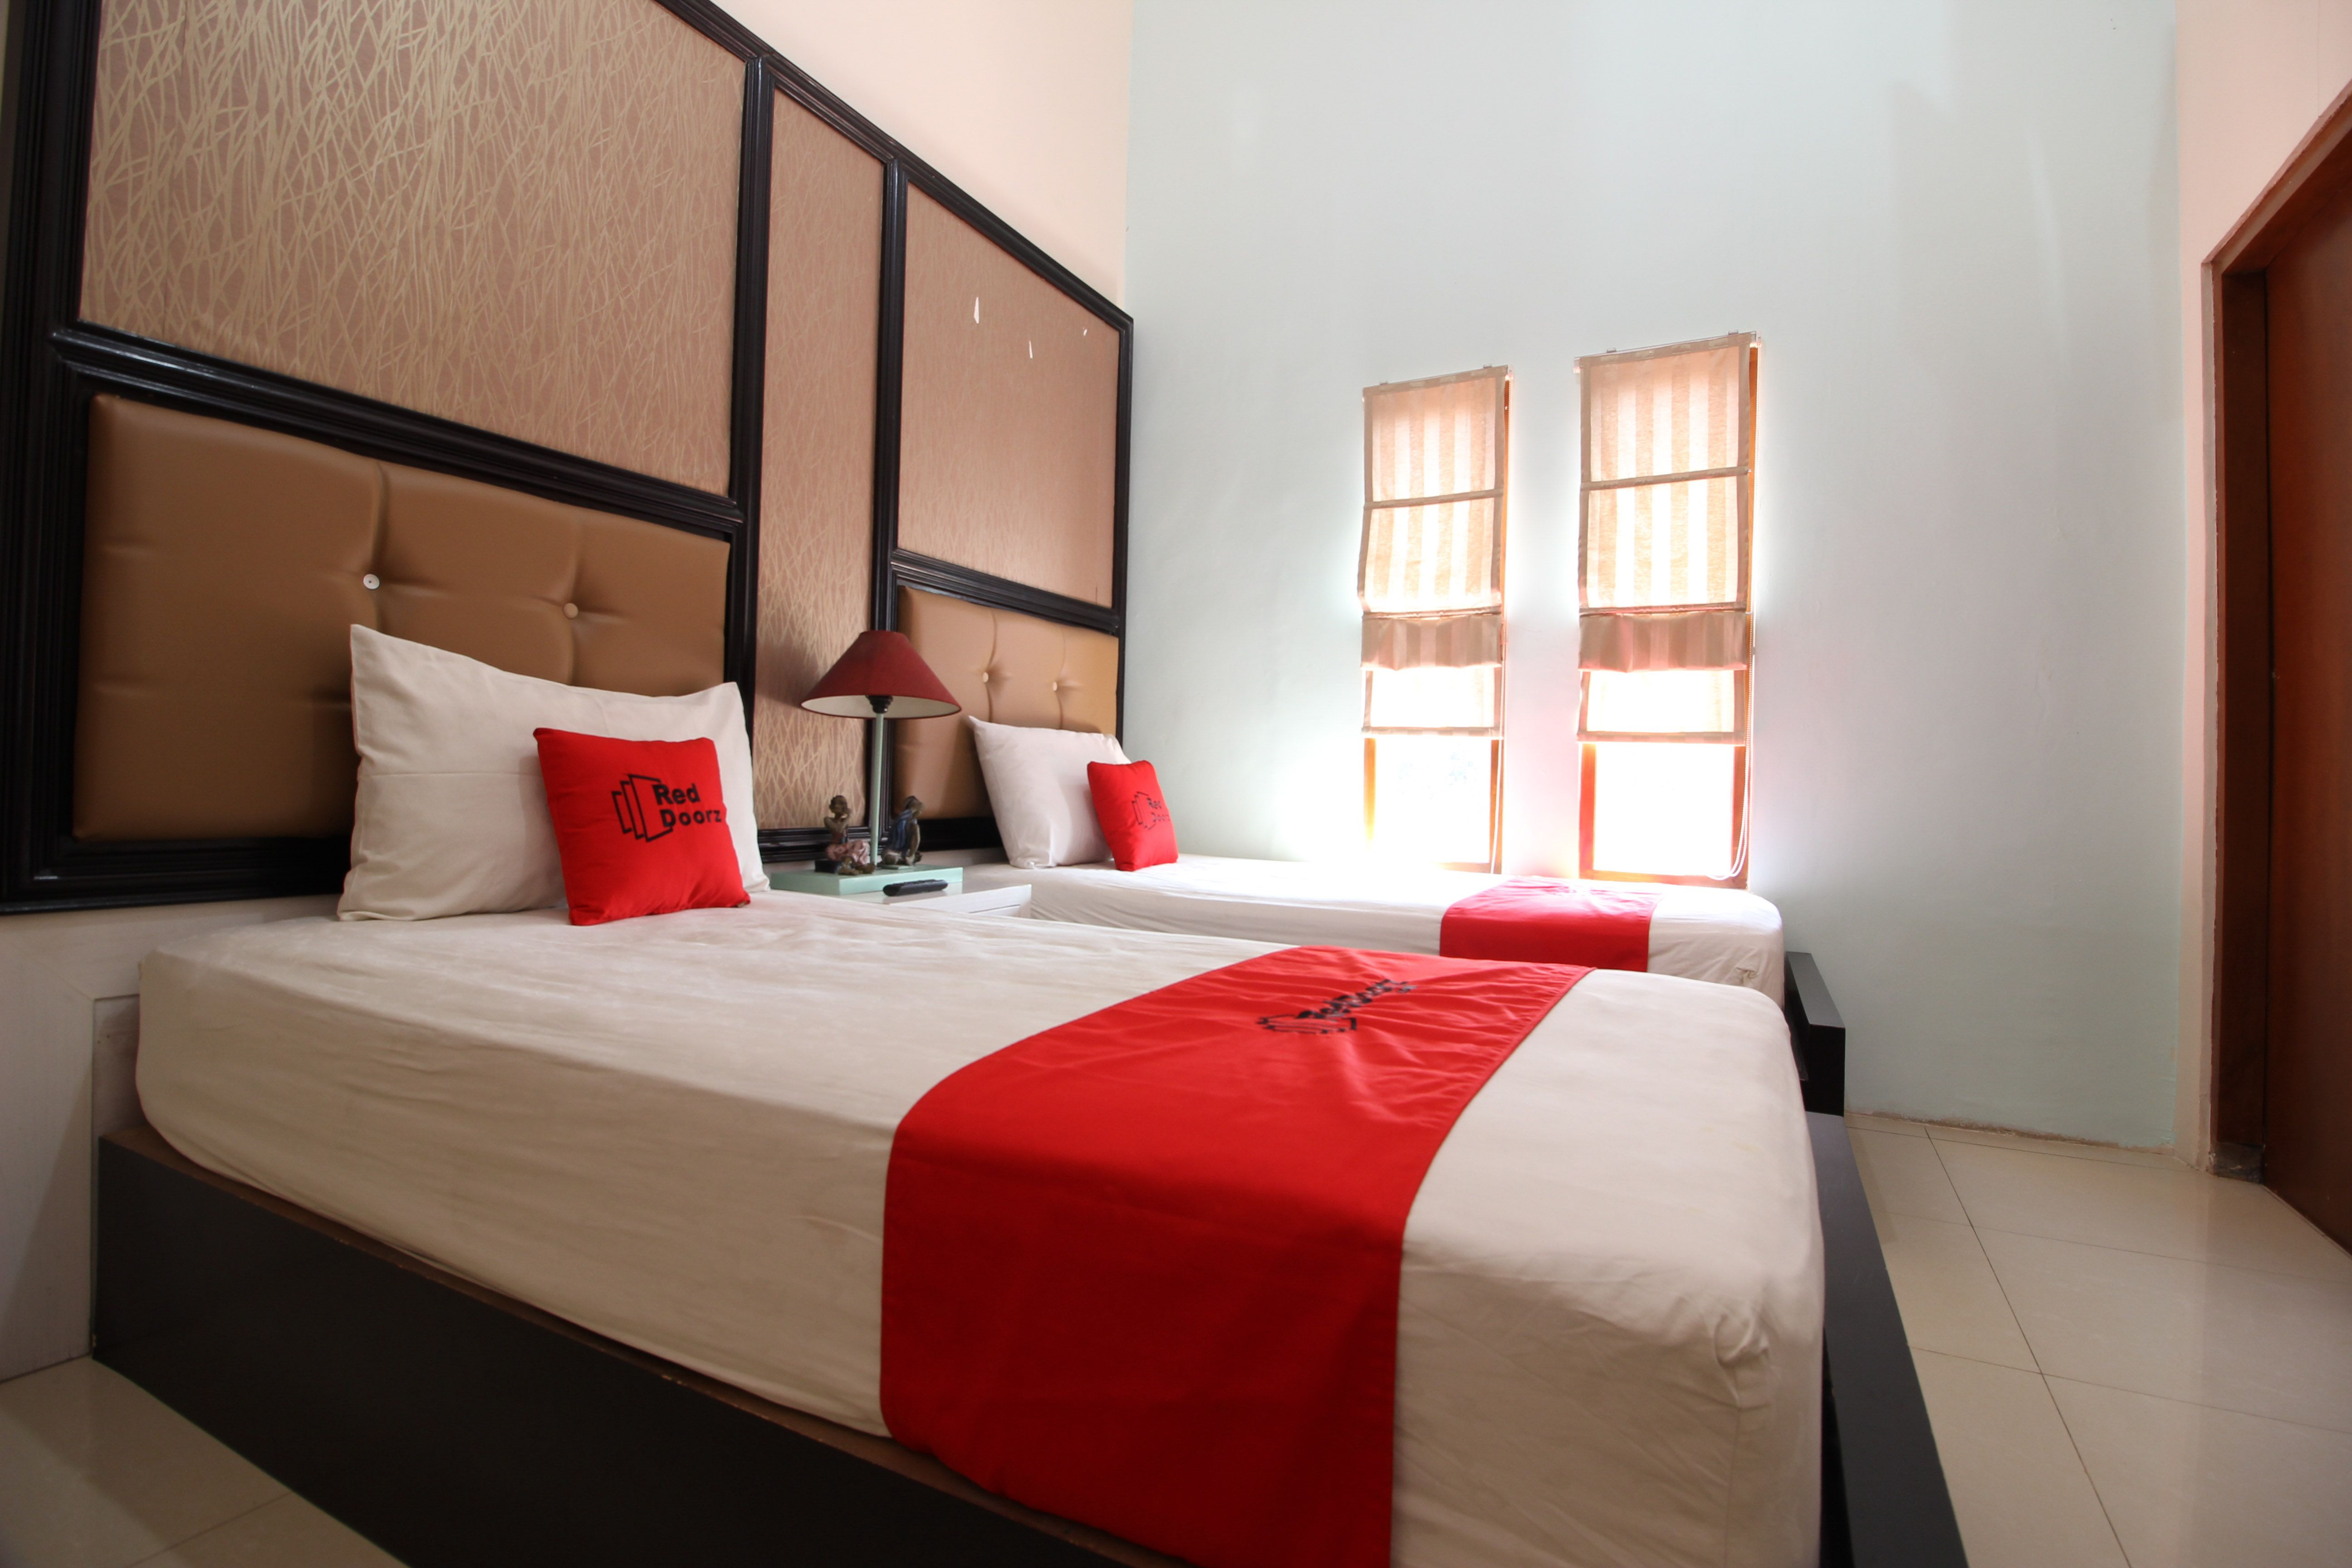 RedDoorz Premium near Tugu Jogja 2, Yogyakarta